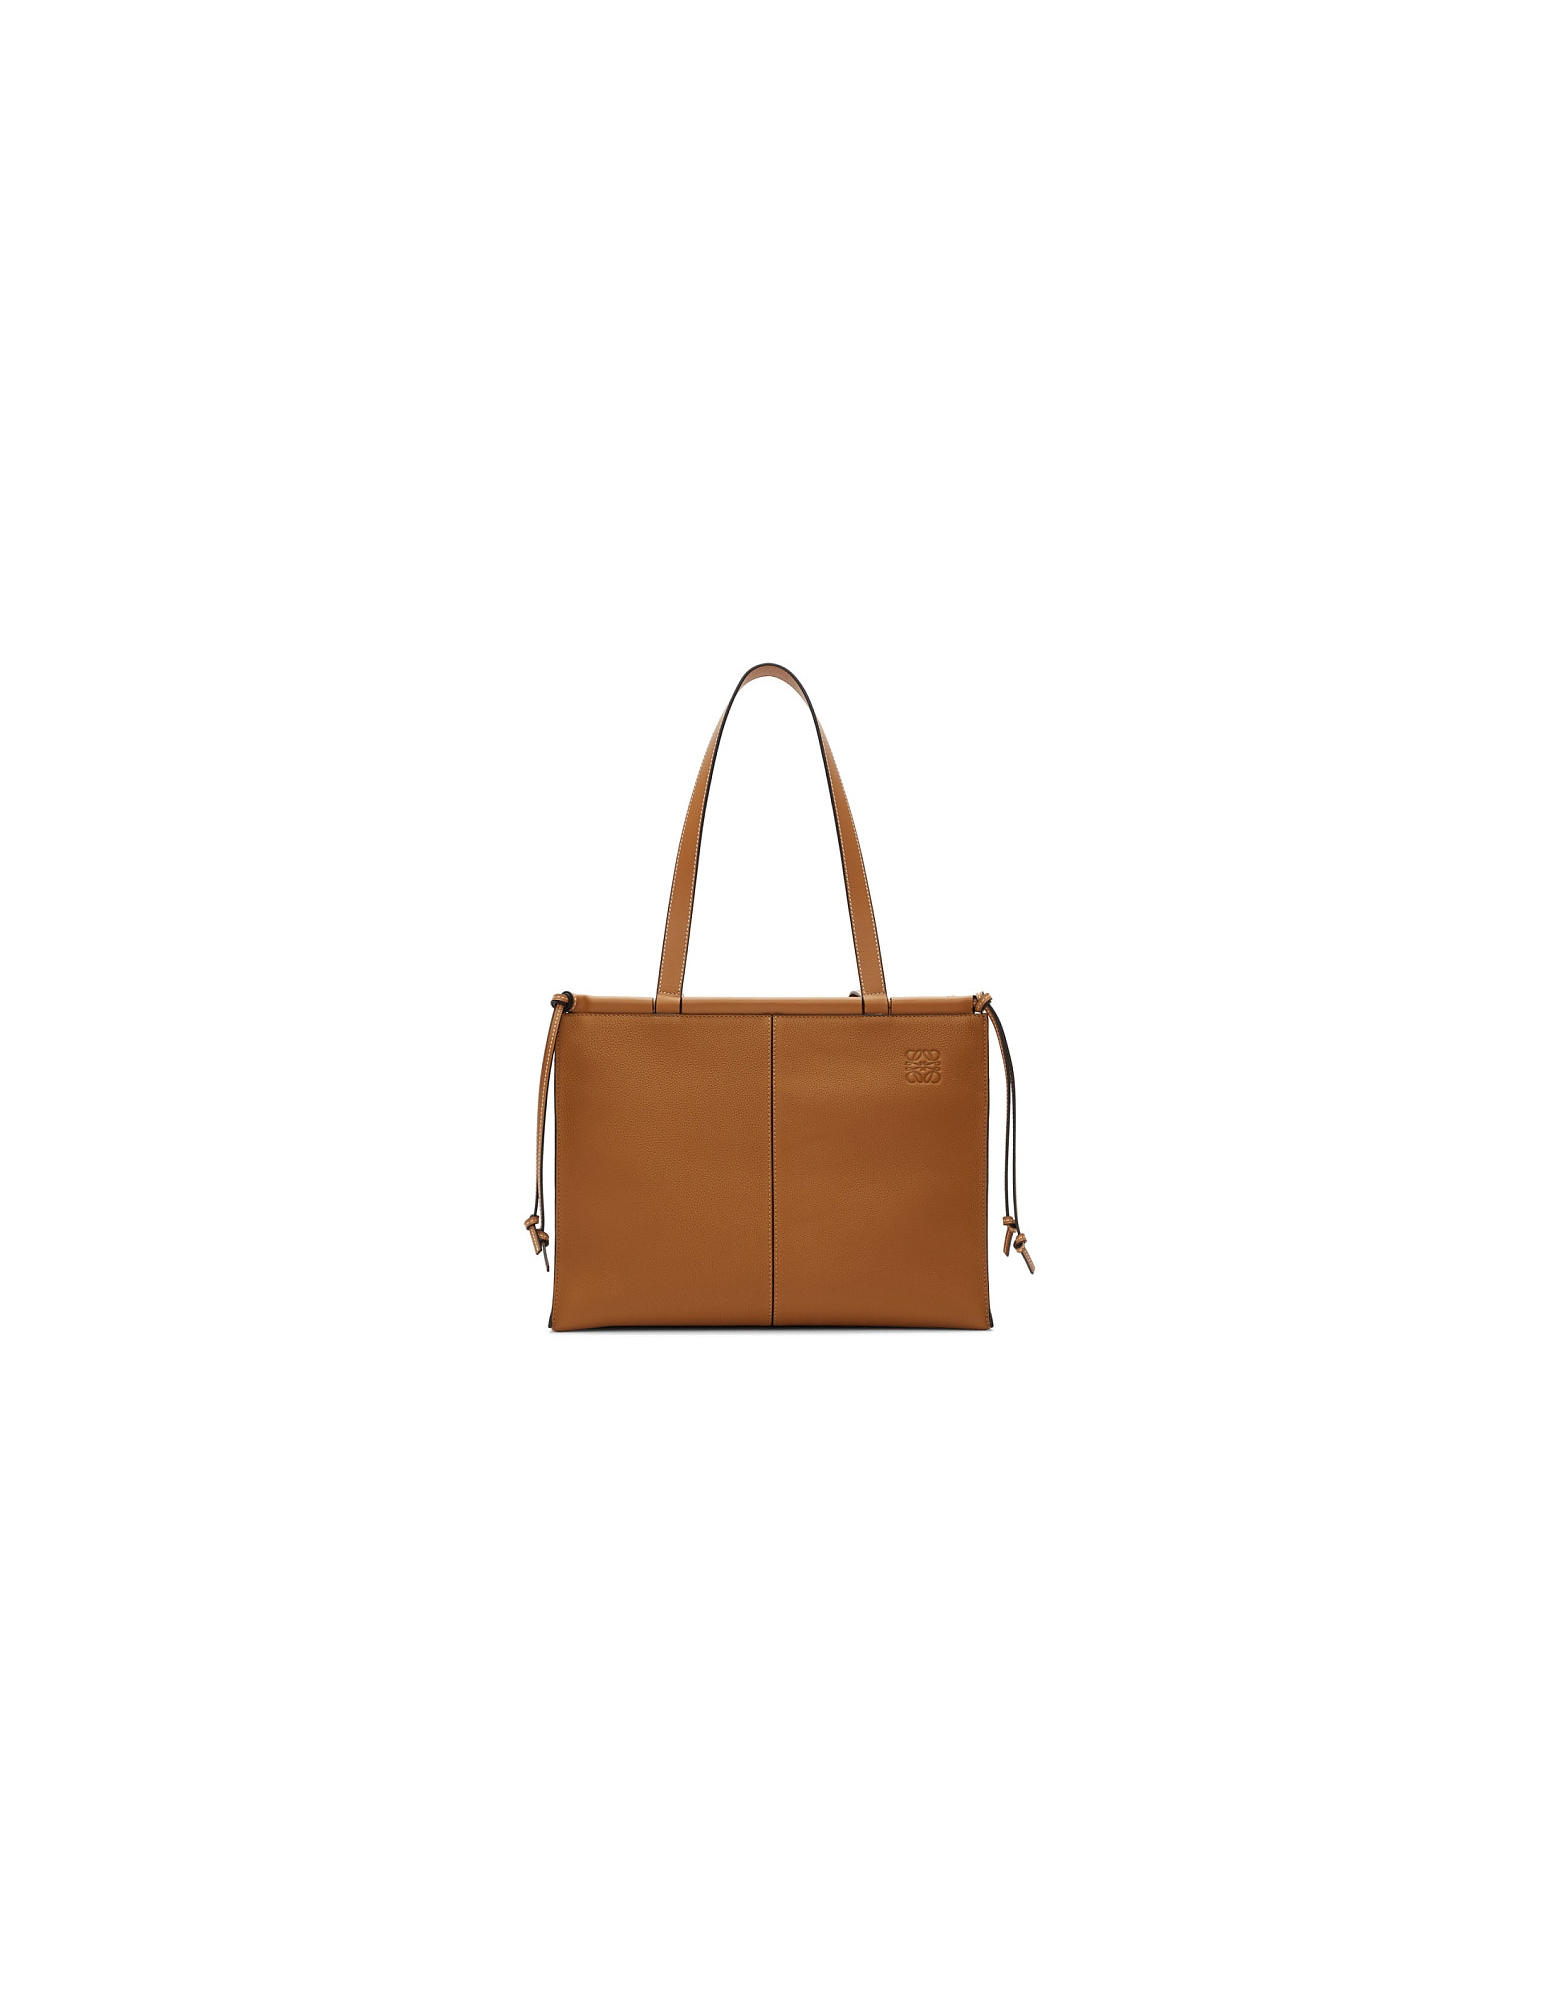 Loewe Designer Handbags, Brown Cushion Tote